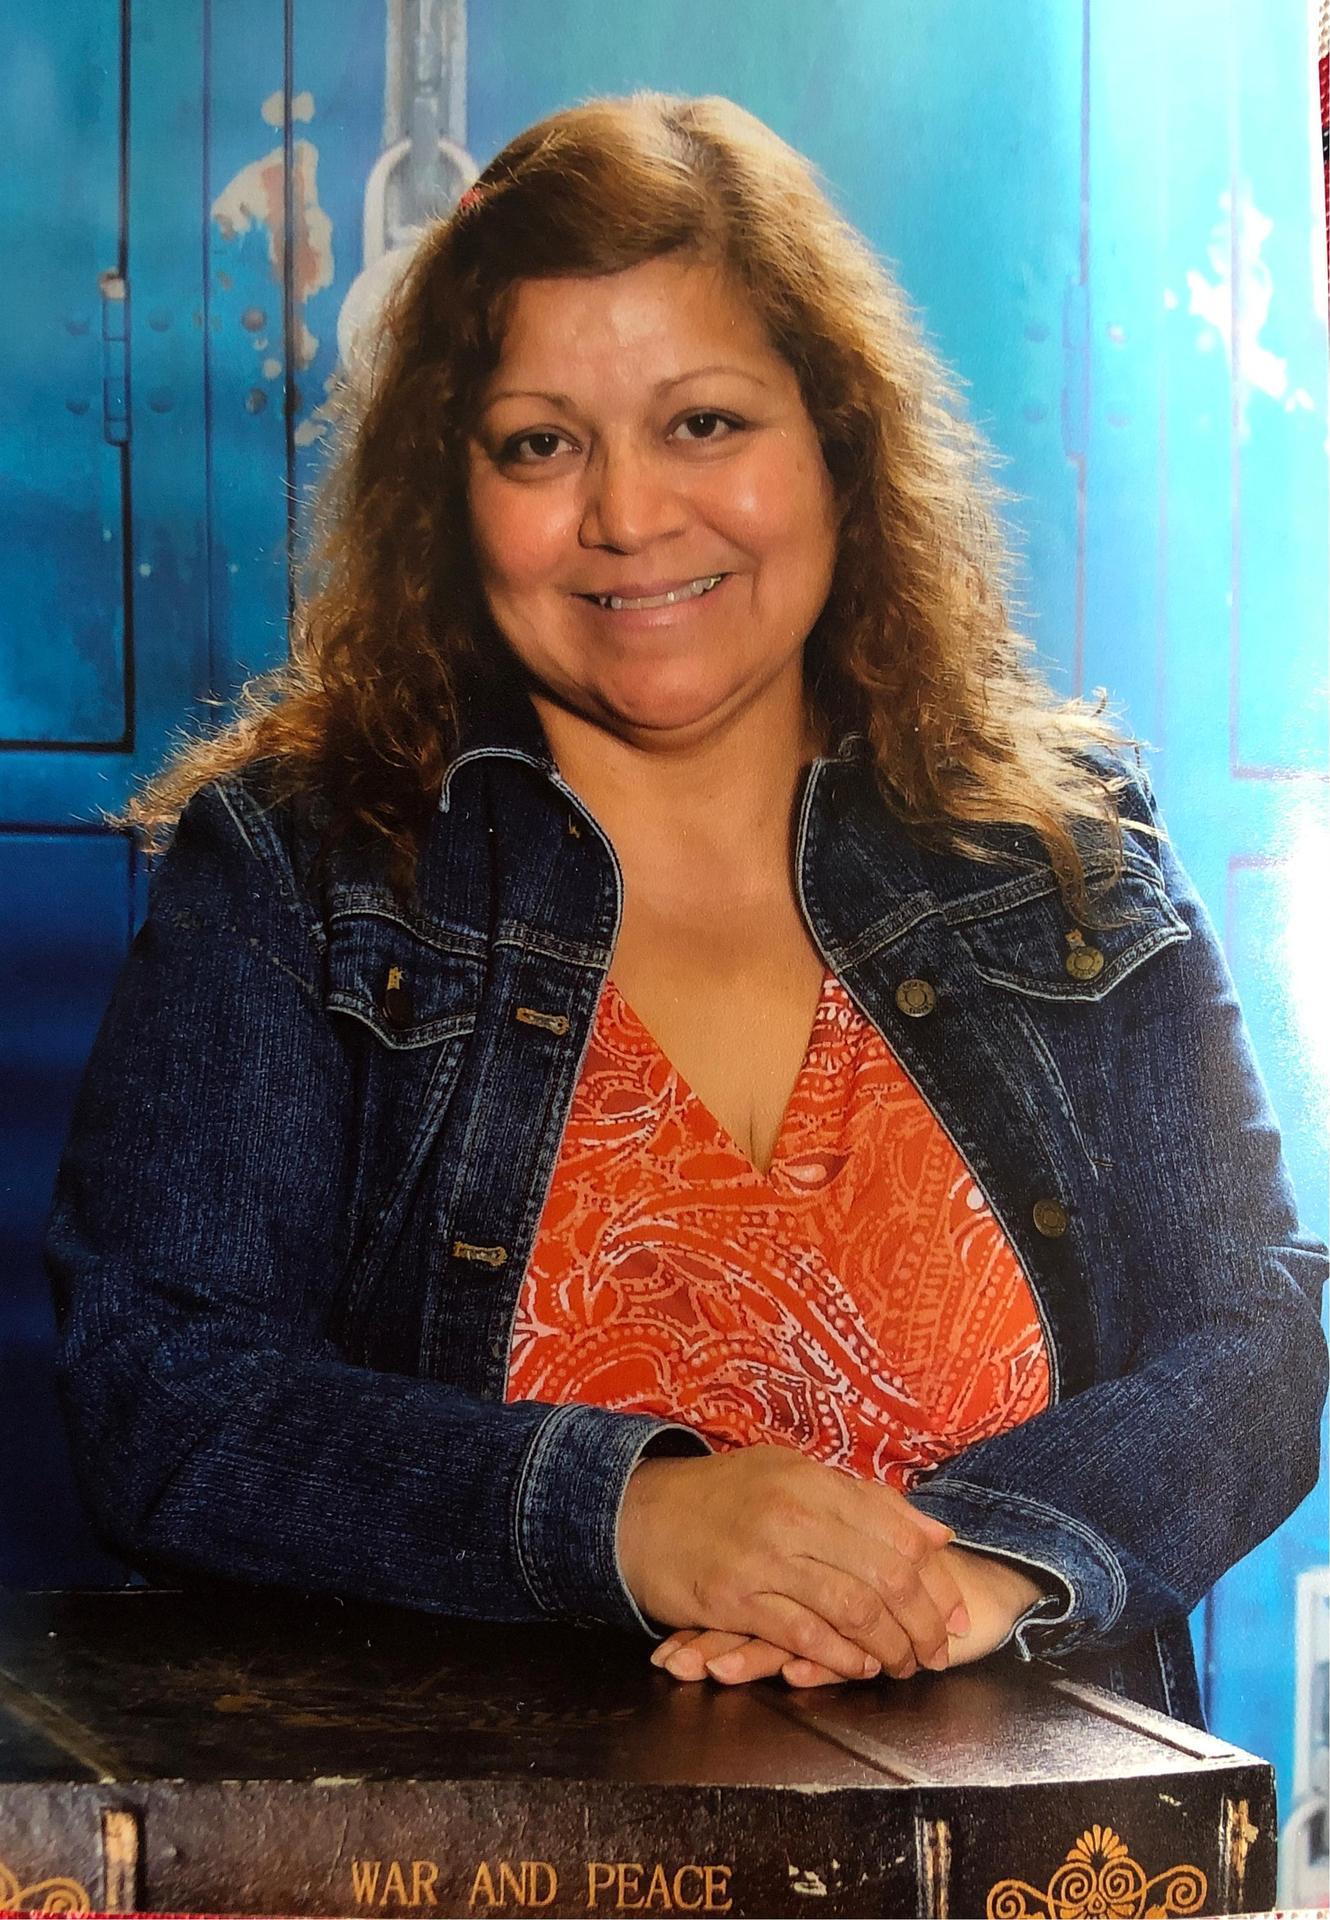 Mrs. Garcia